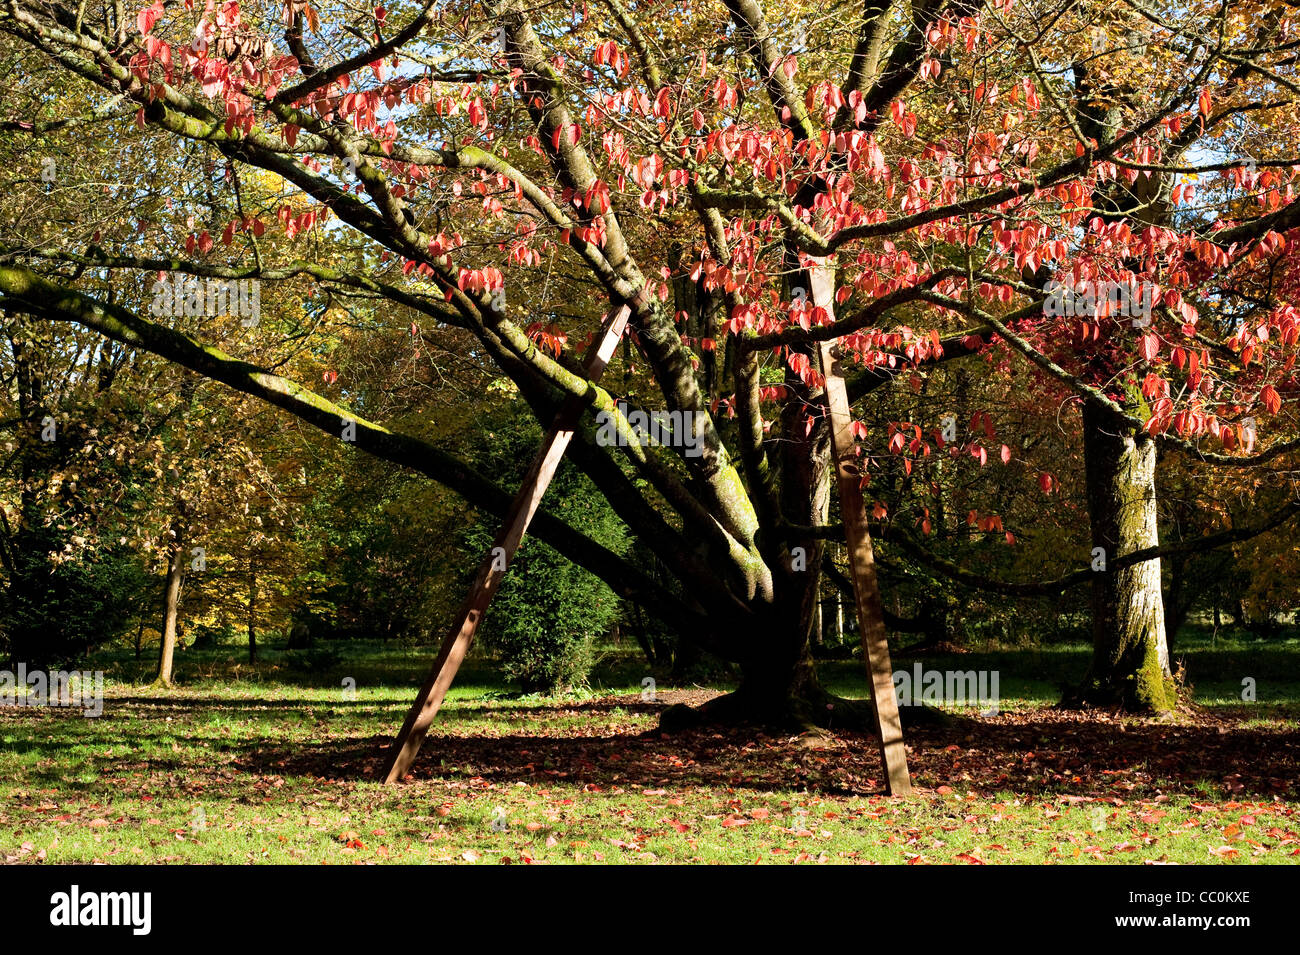 Prunus Sargentii, Sargent's Cherry tree, in autumn Stock Photo